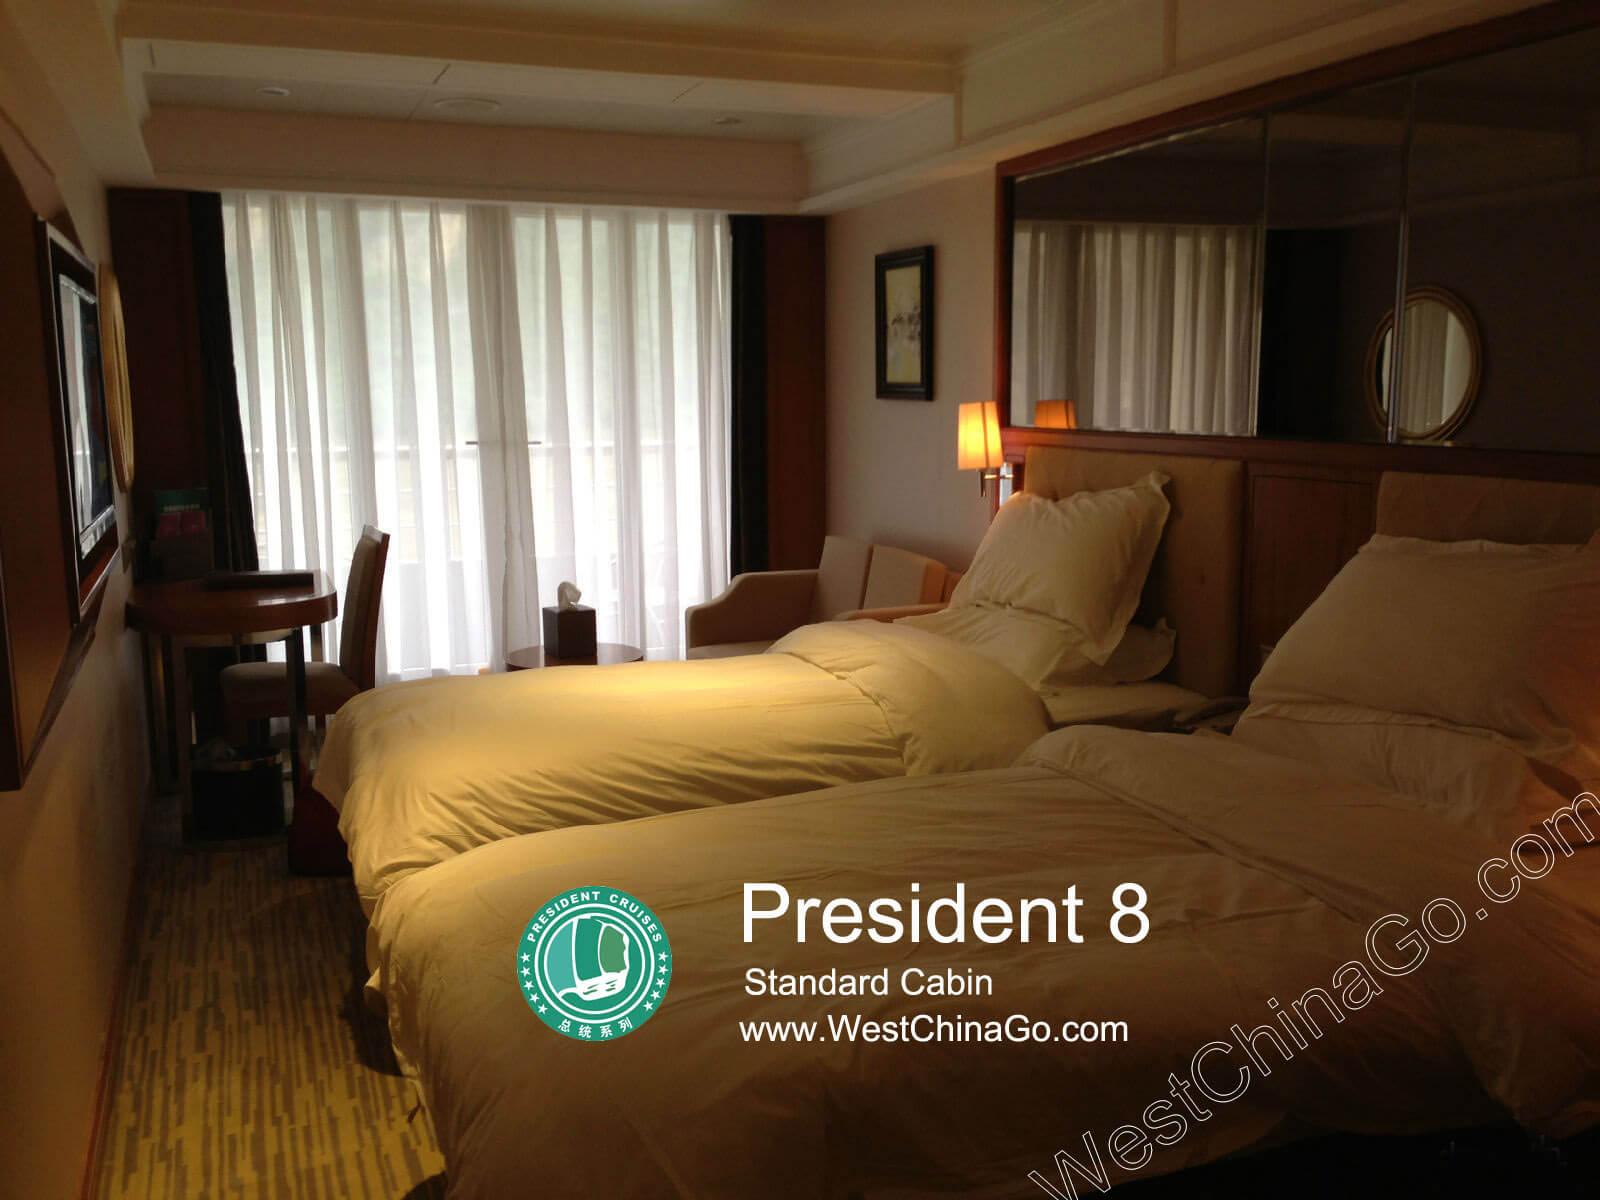 president 8 standard cabin